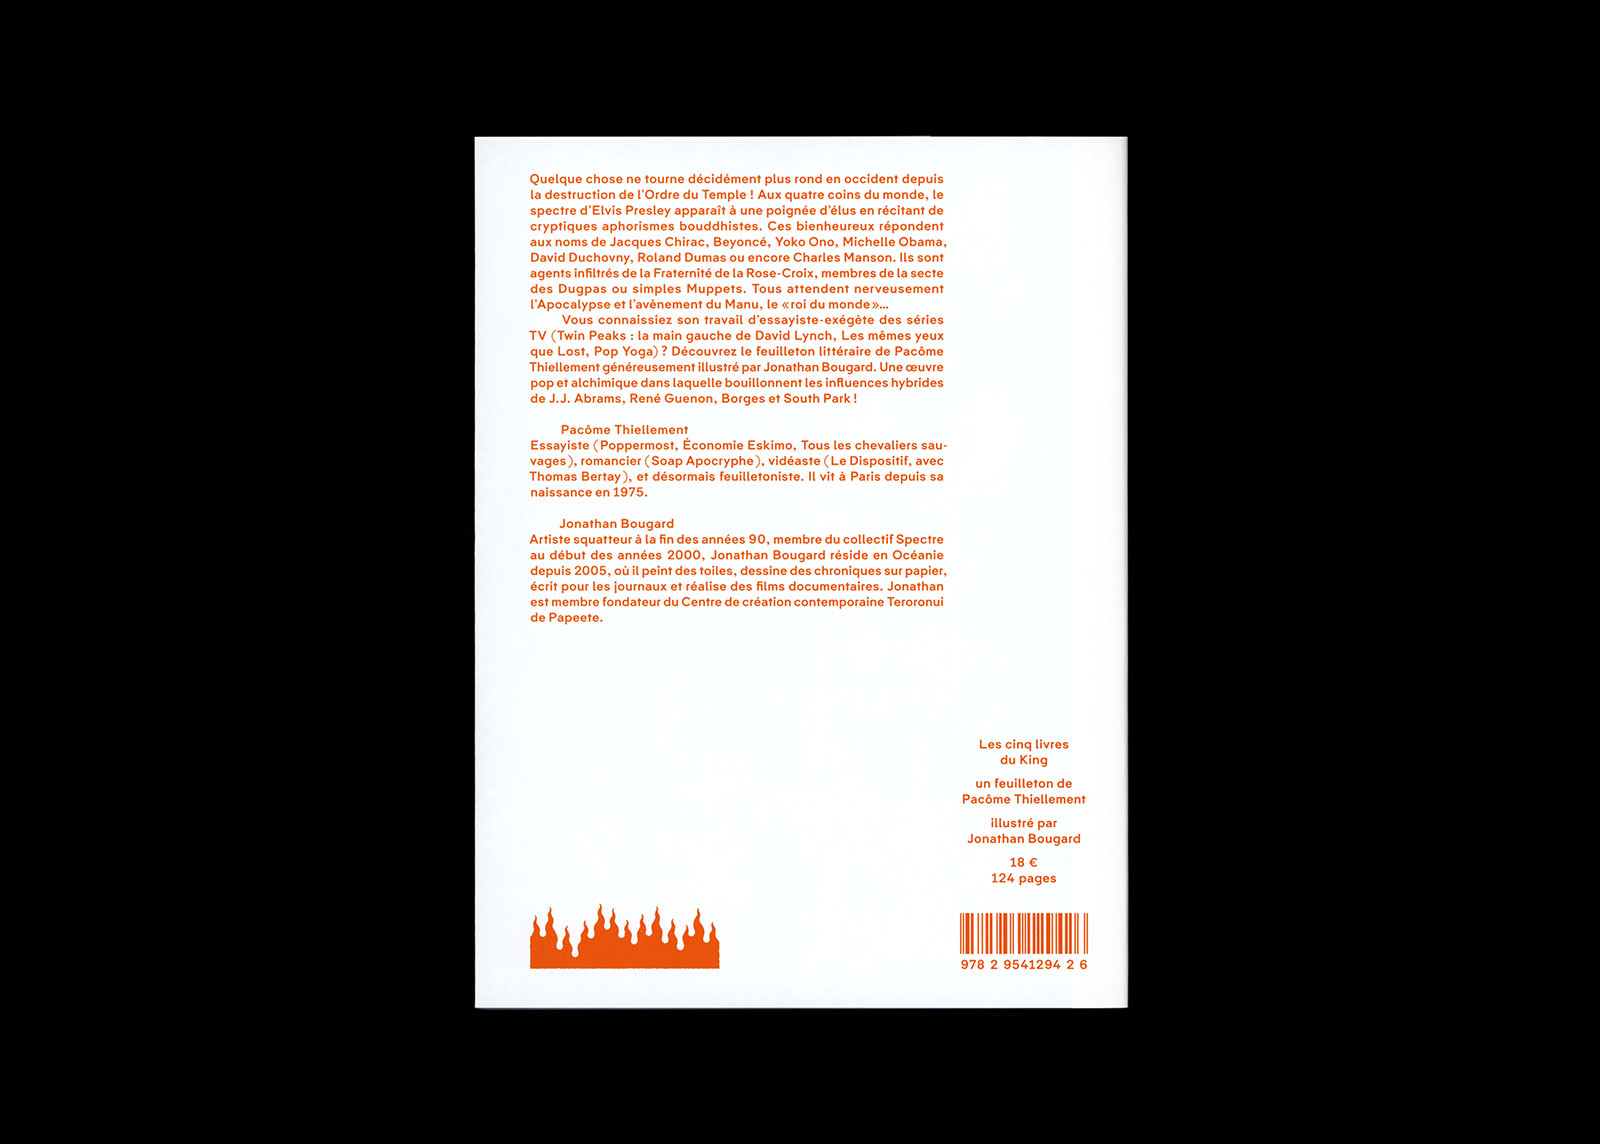 Les cinq livres du King 13